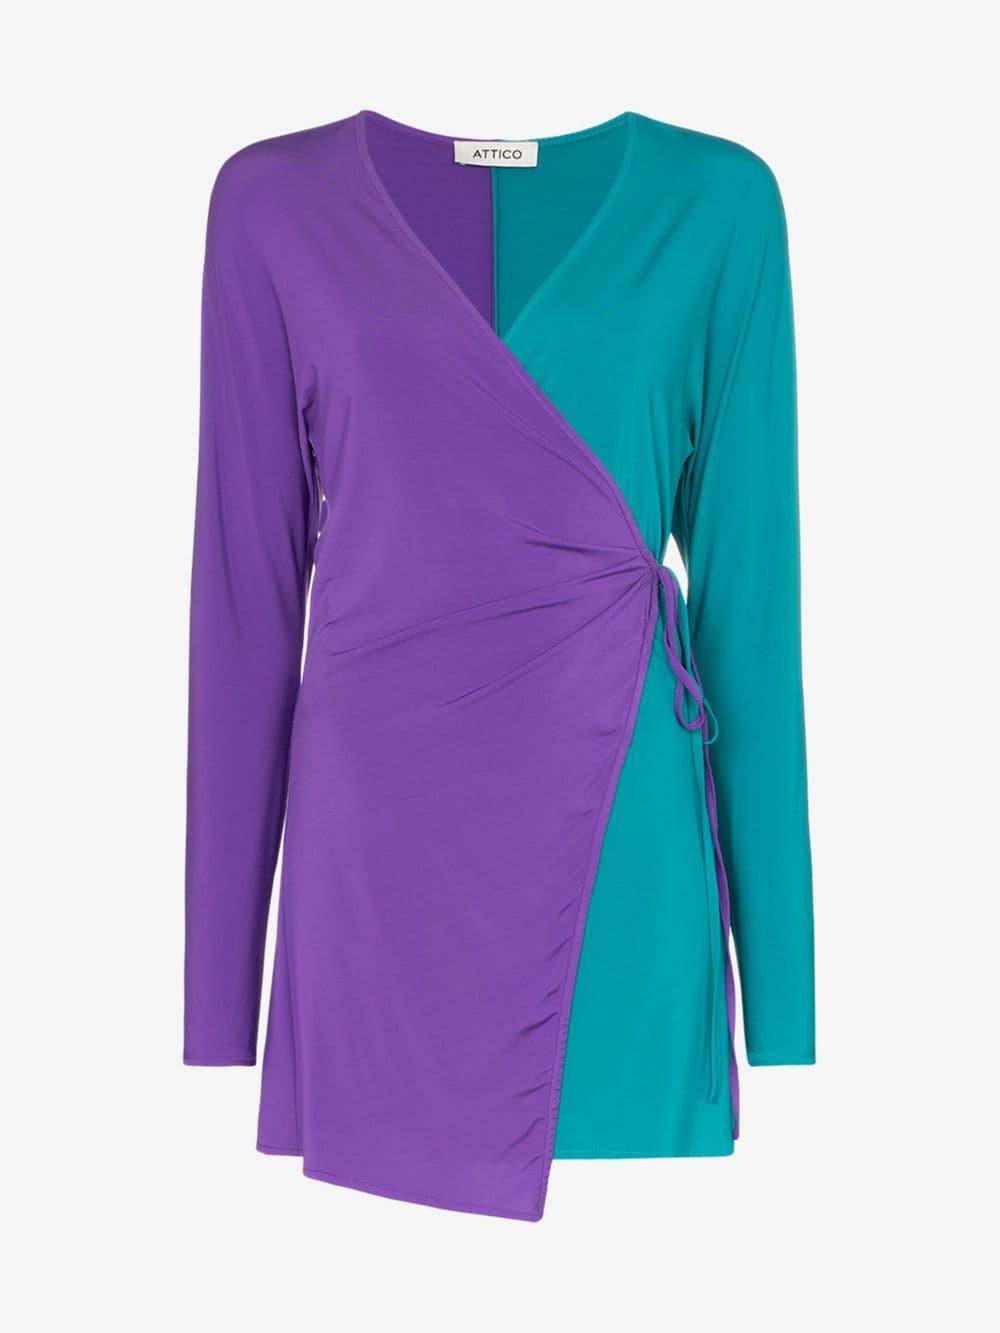 Attico Two-Tone Jersey Wrap Dress in purple